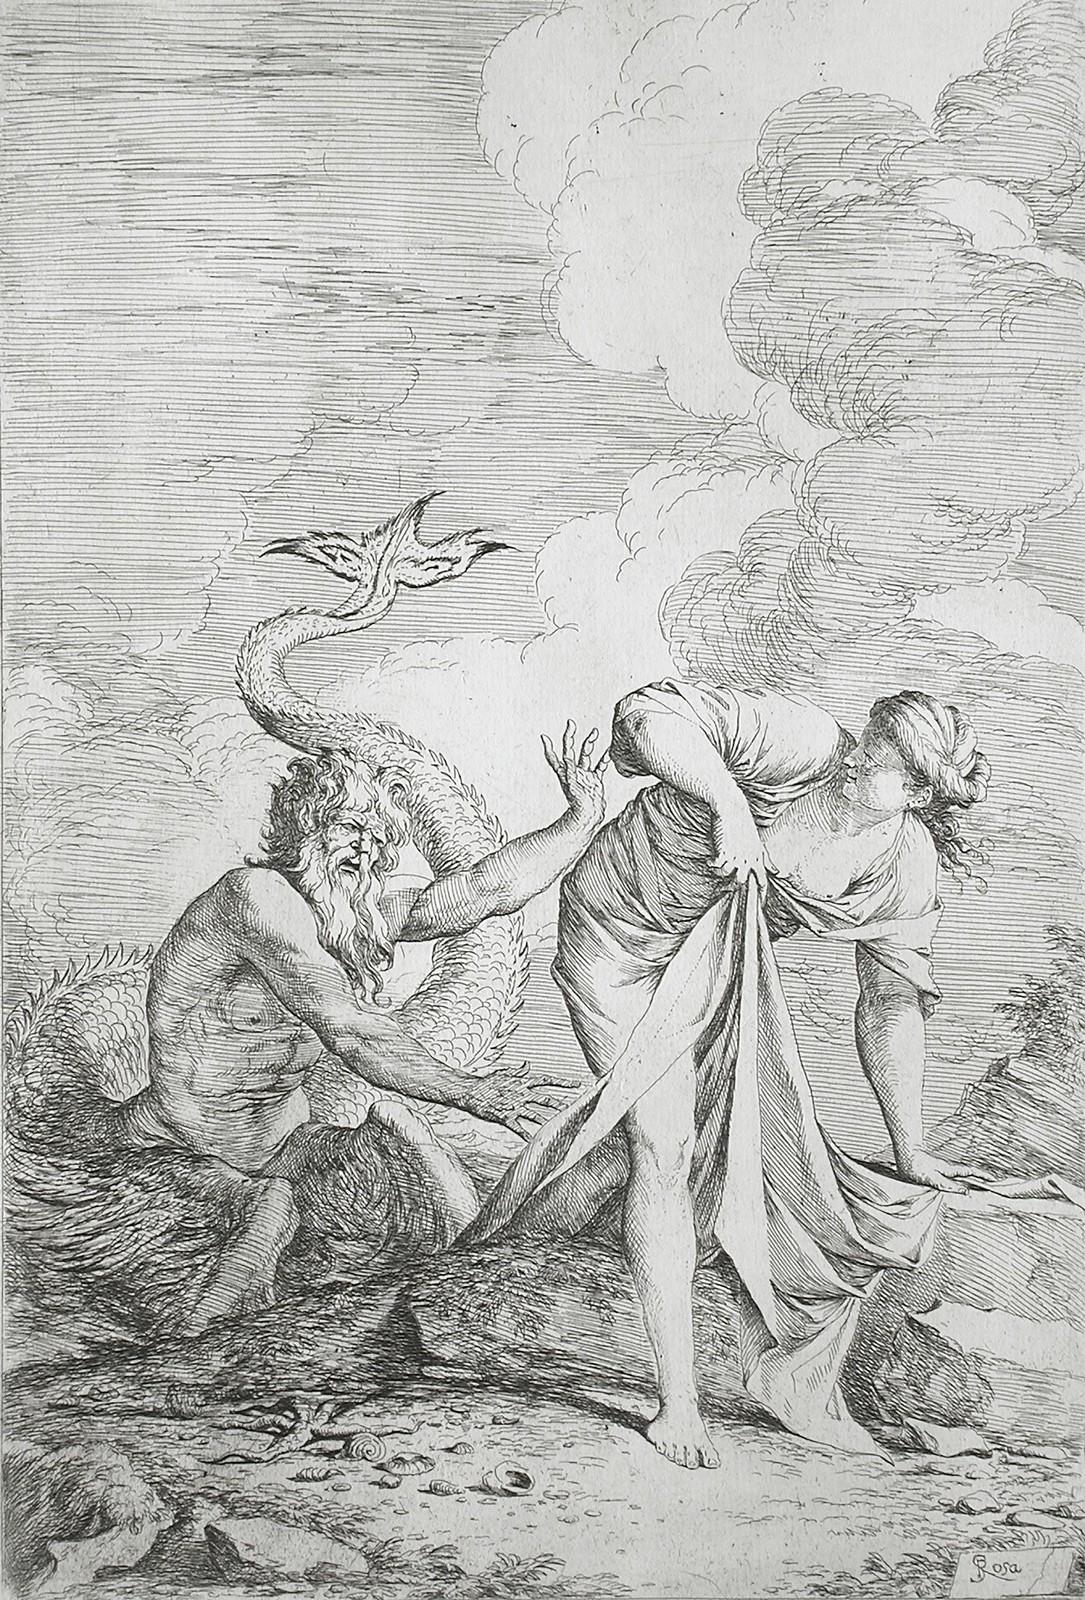 Salvator Rosa - Glaucus and Scylla, 1661